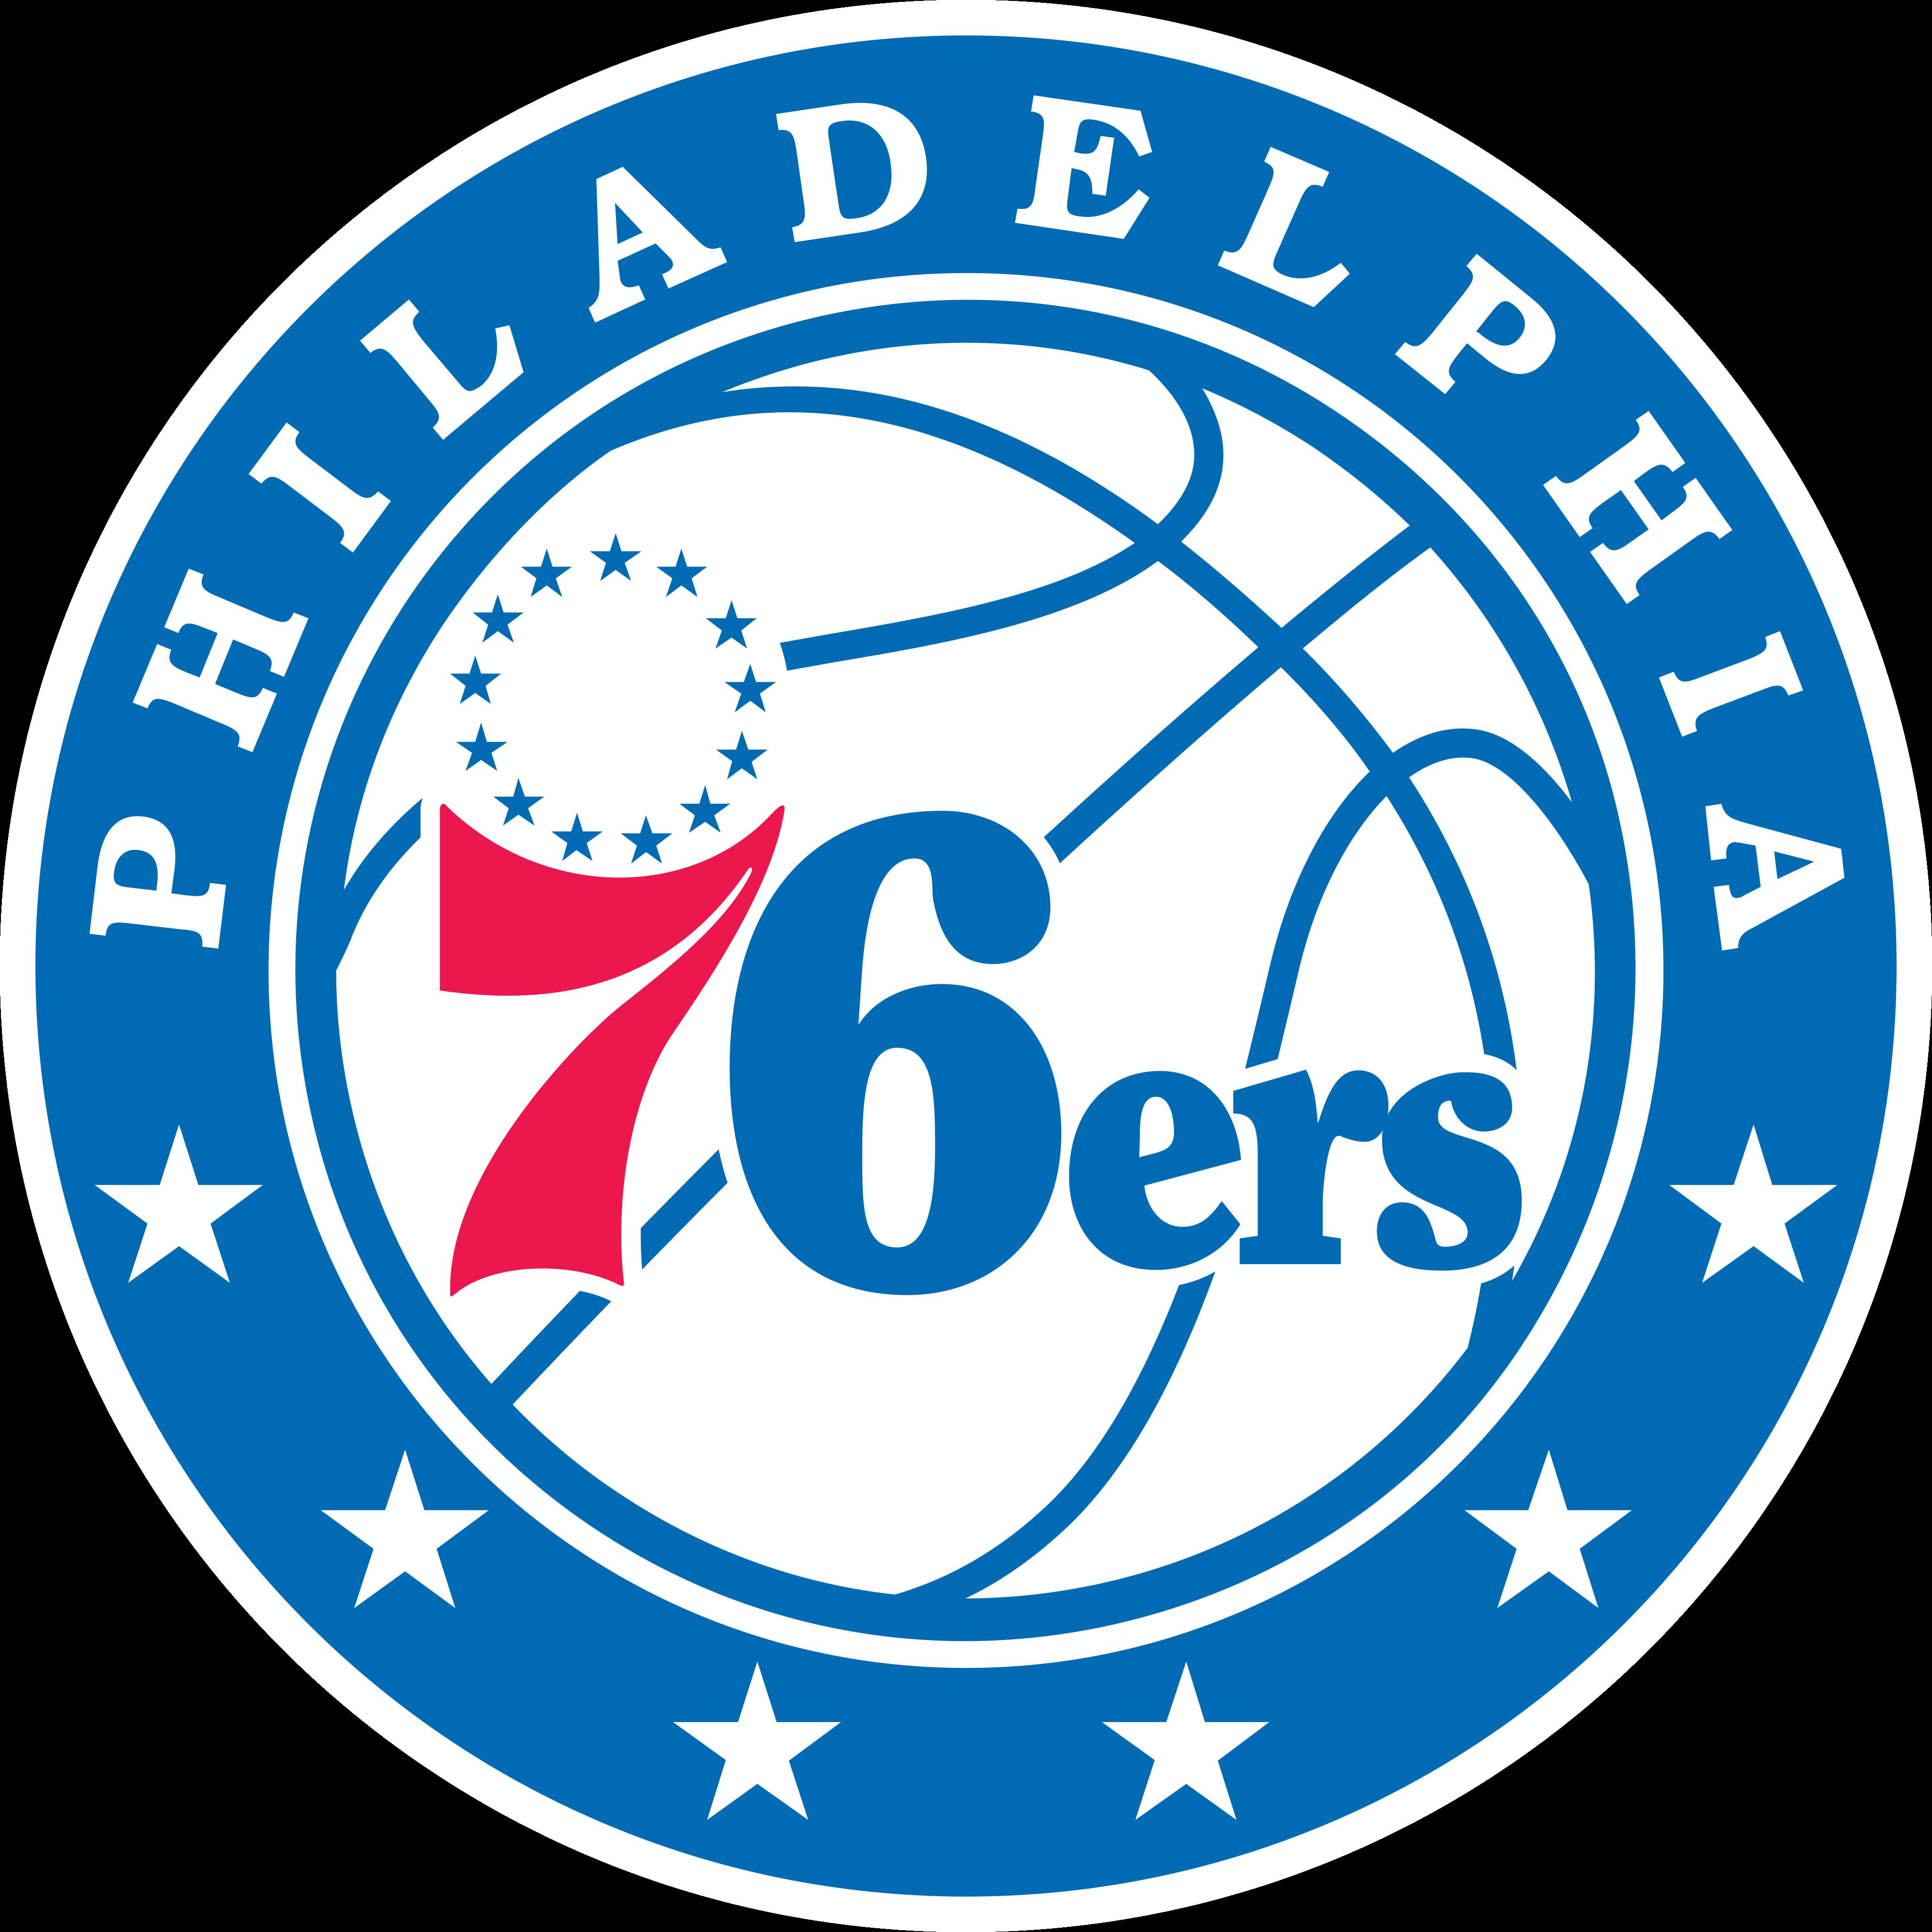 philadelphia 76ers logo - Philadelphia 76ers Logo